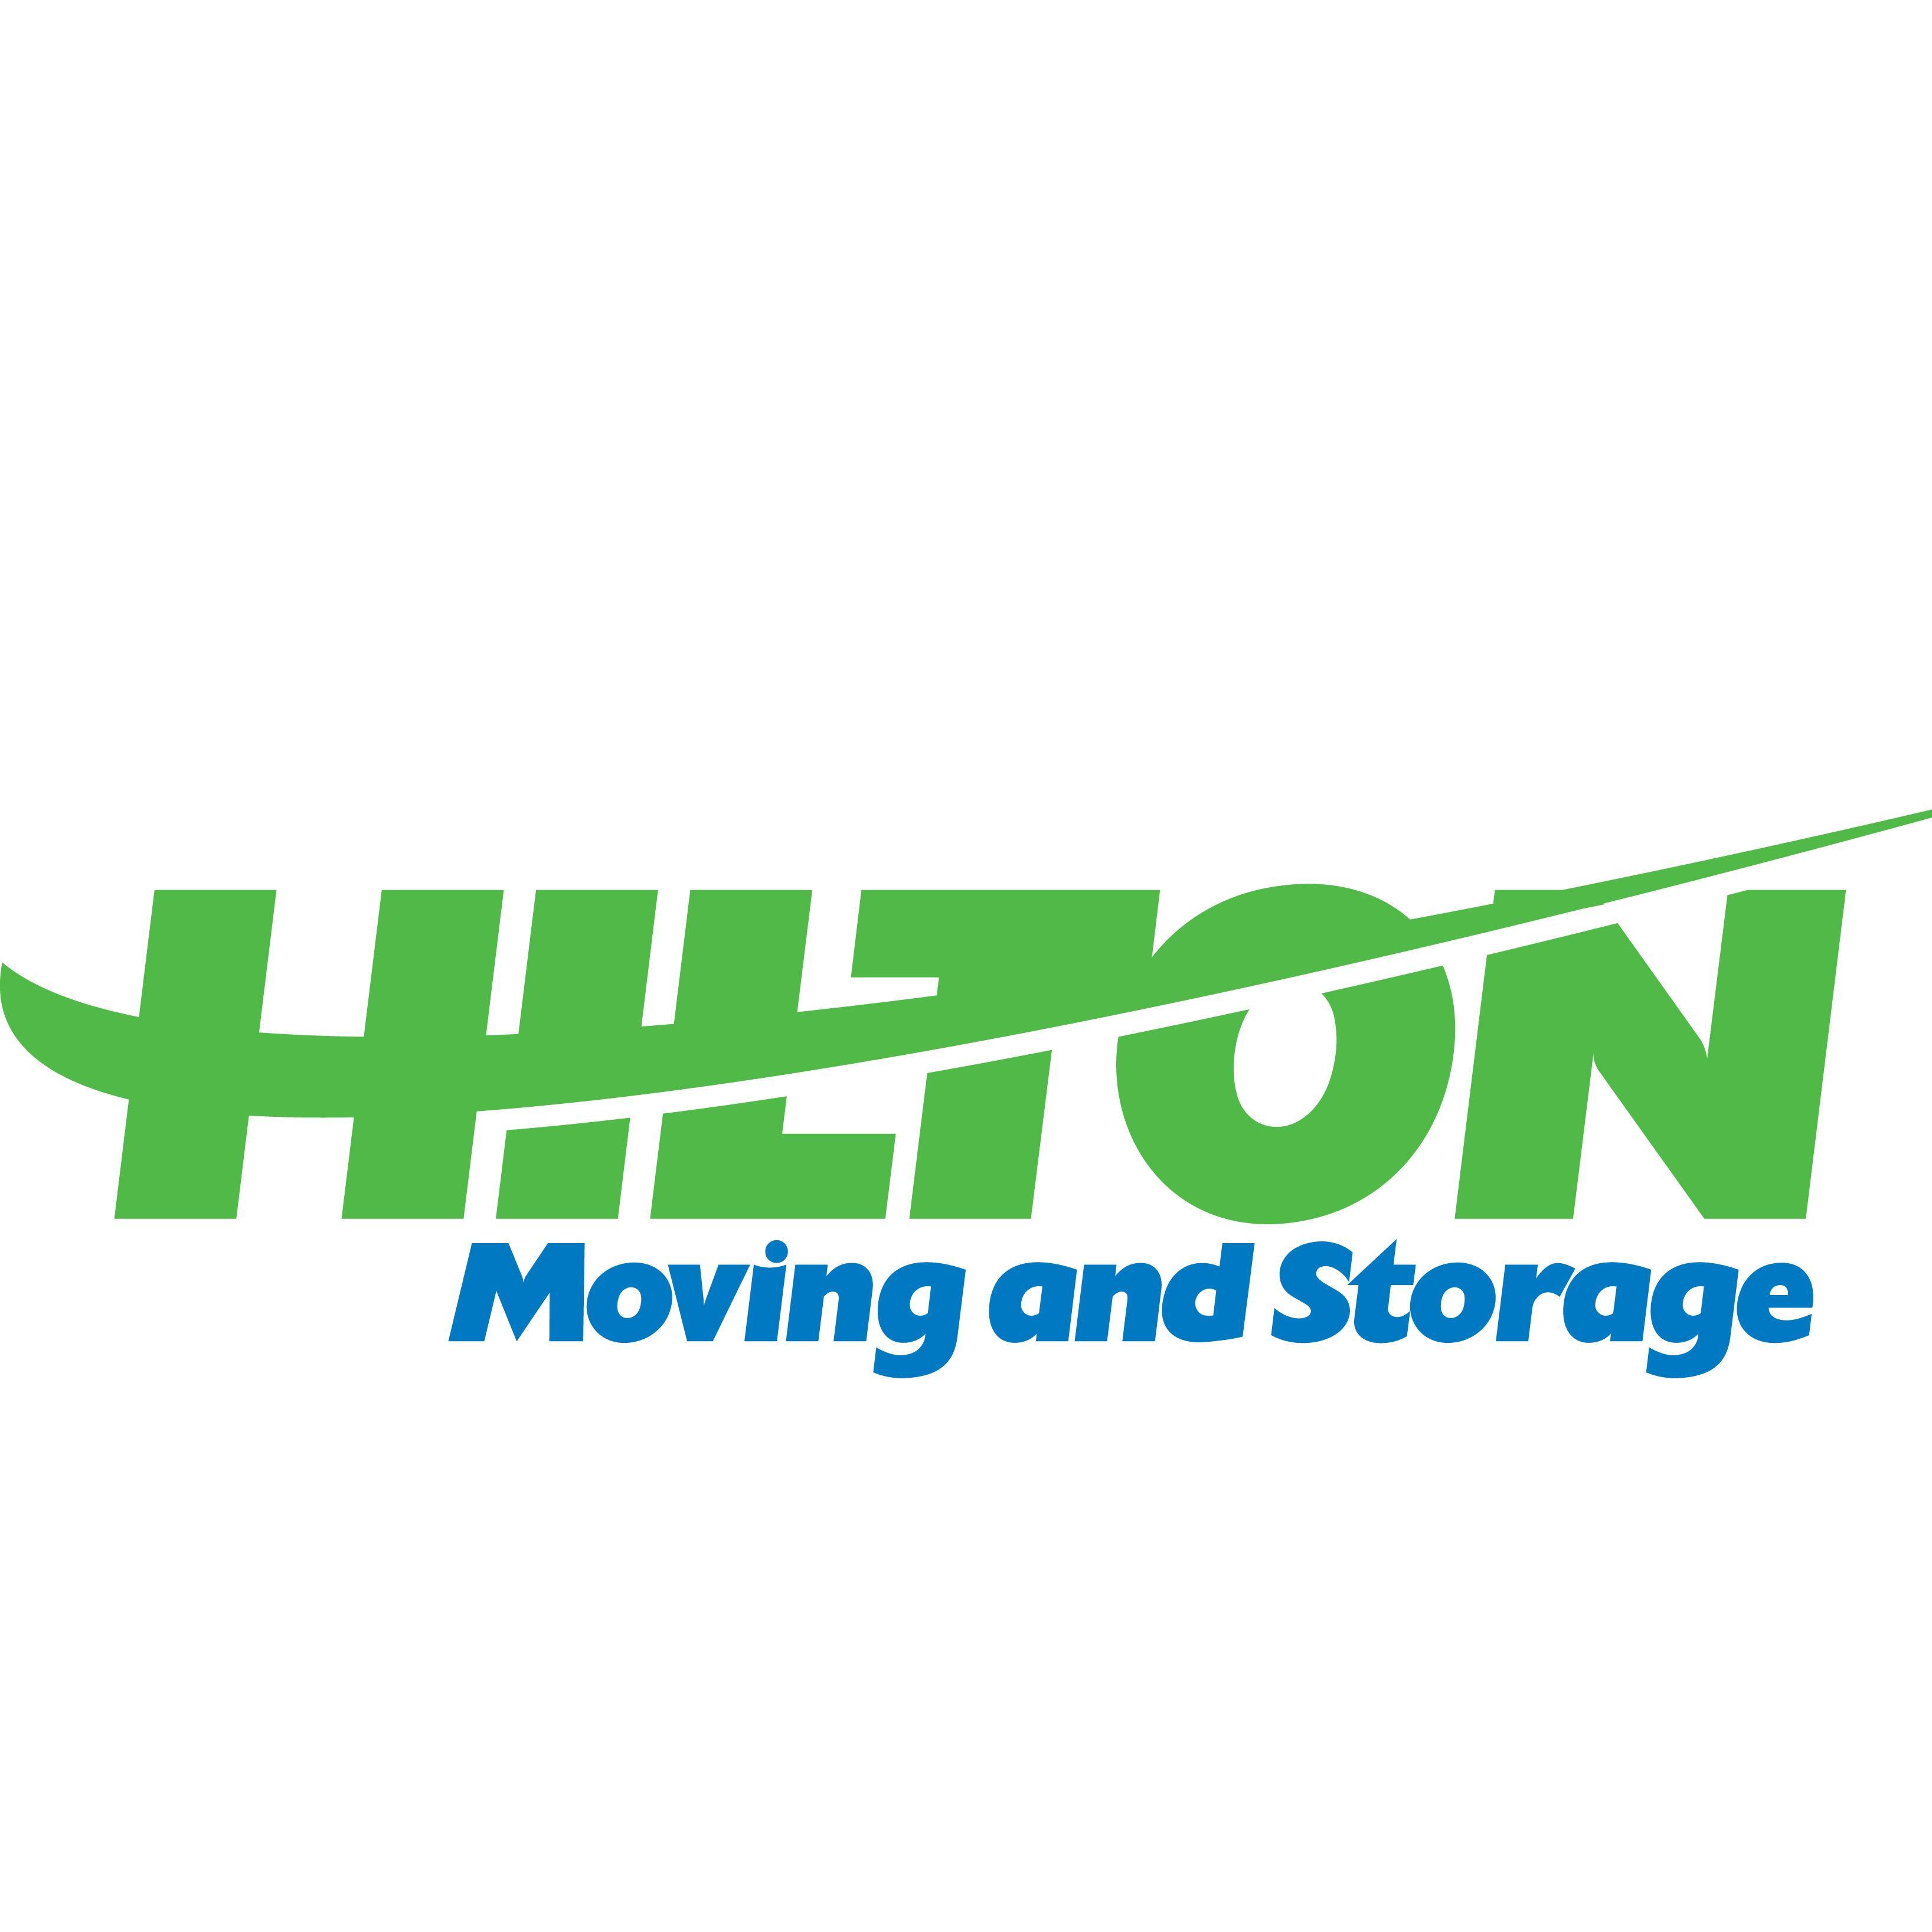 Hilton Moving, Naples Movers